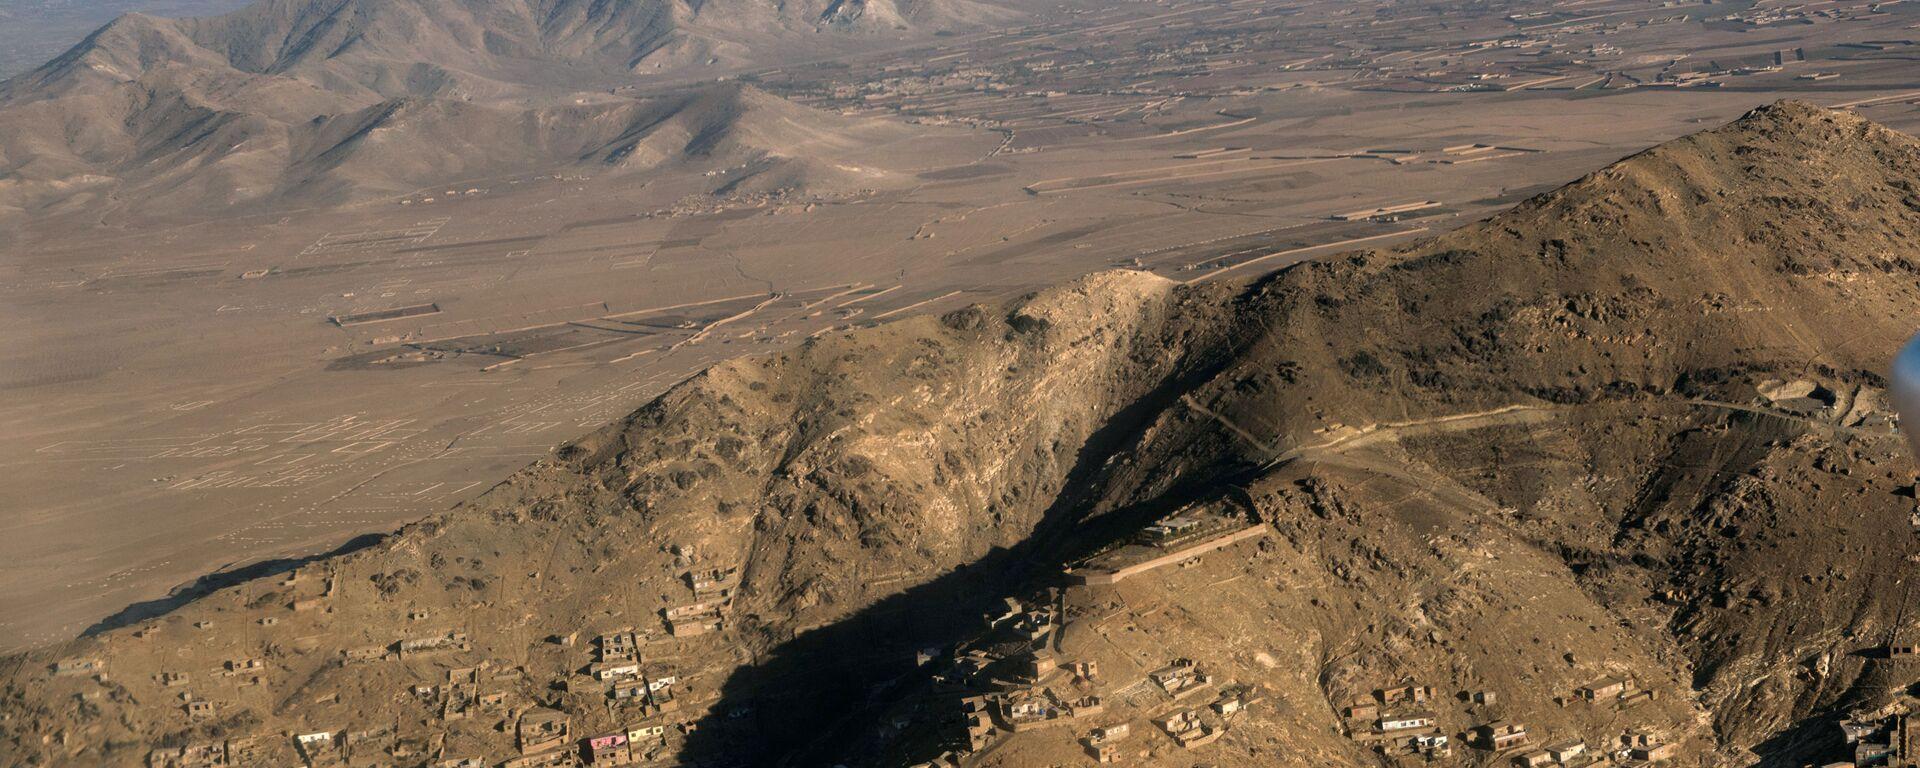 Вид на город Кабул с борта самолета. - Sputnik Армения, 1920, 24.08.2021